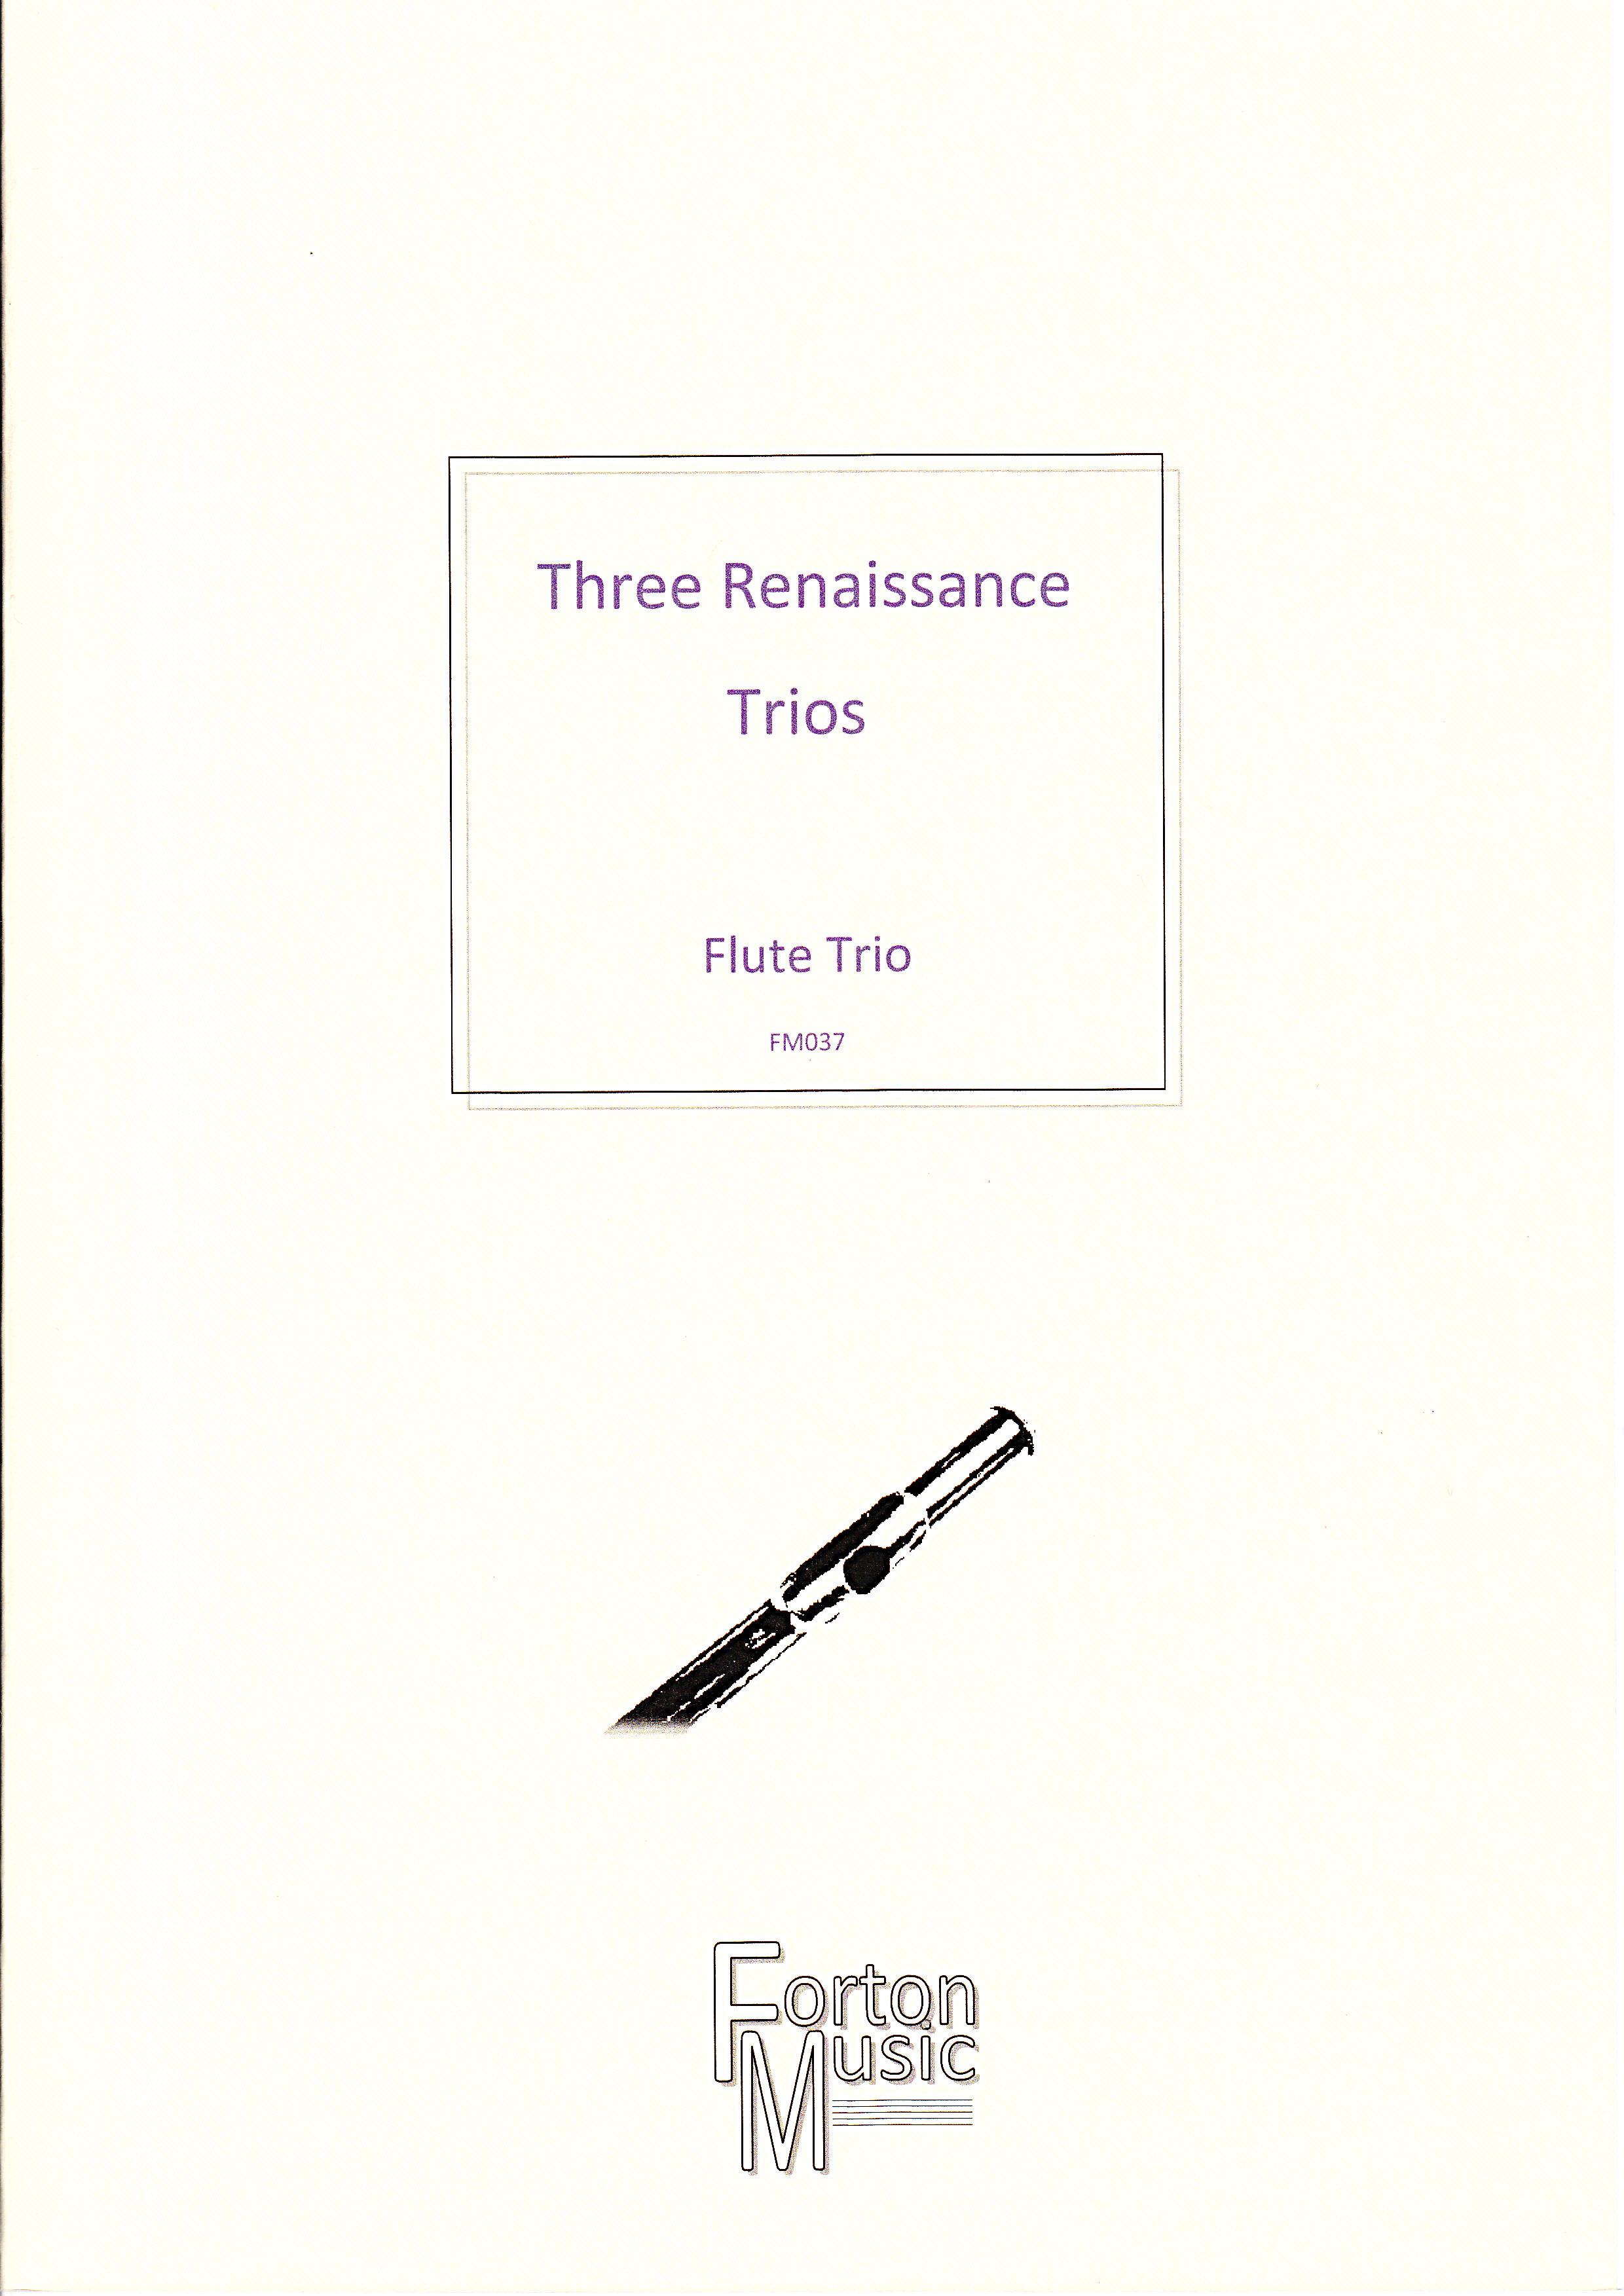 THREE RENAISSANCE TRIOS